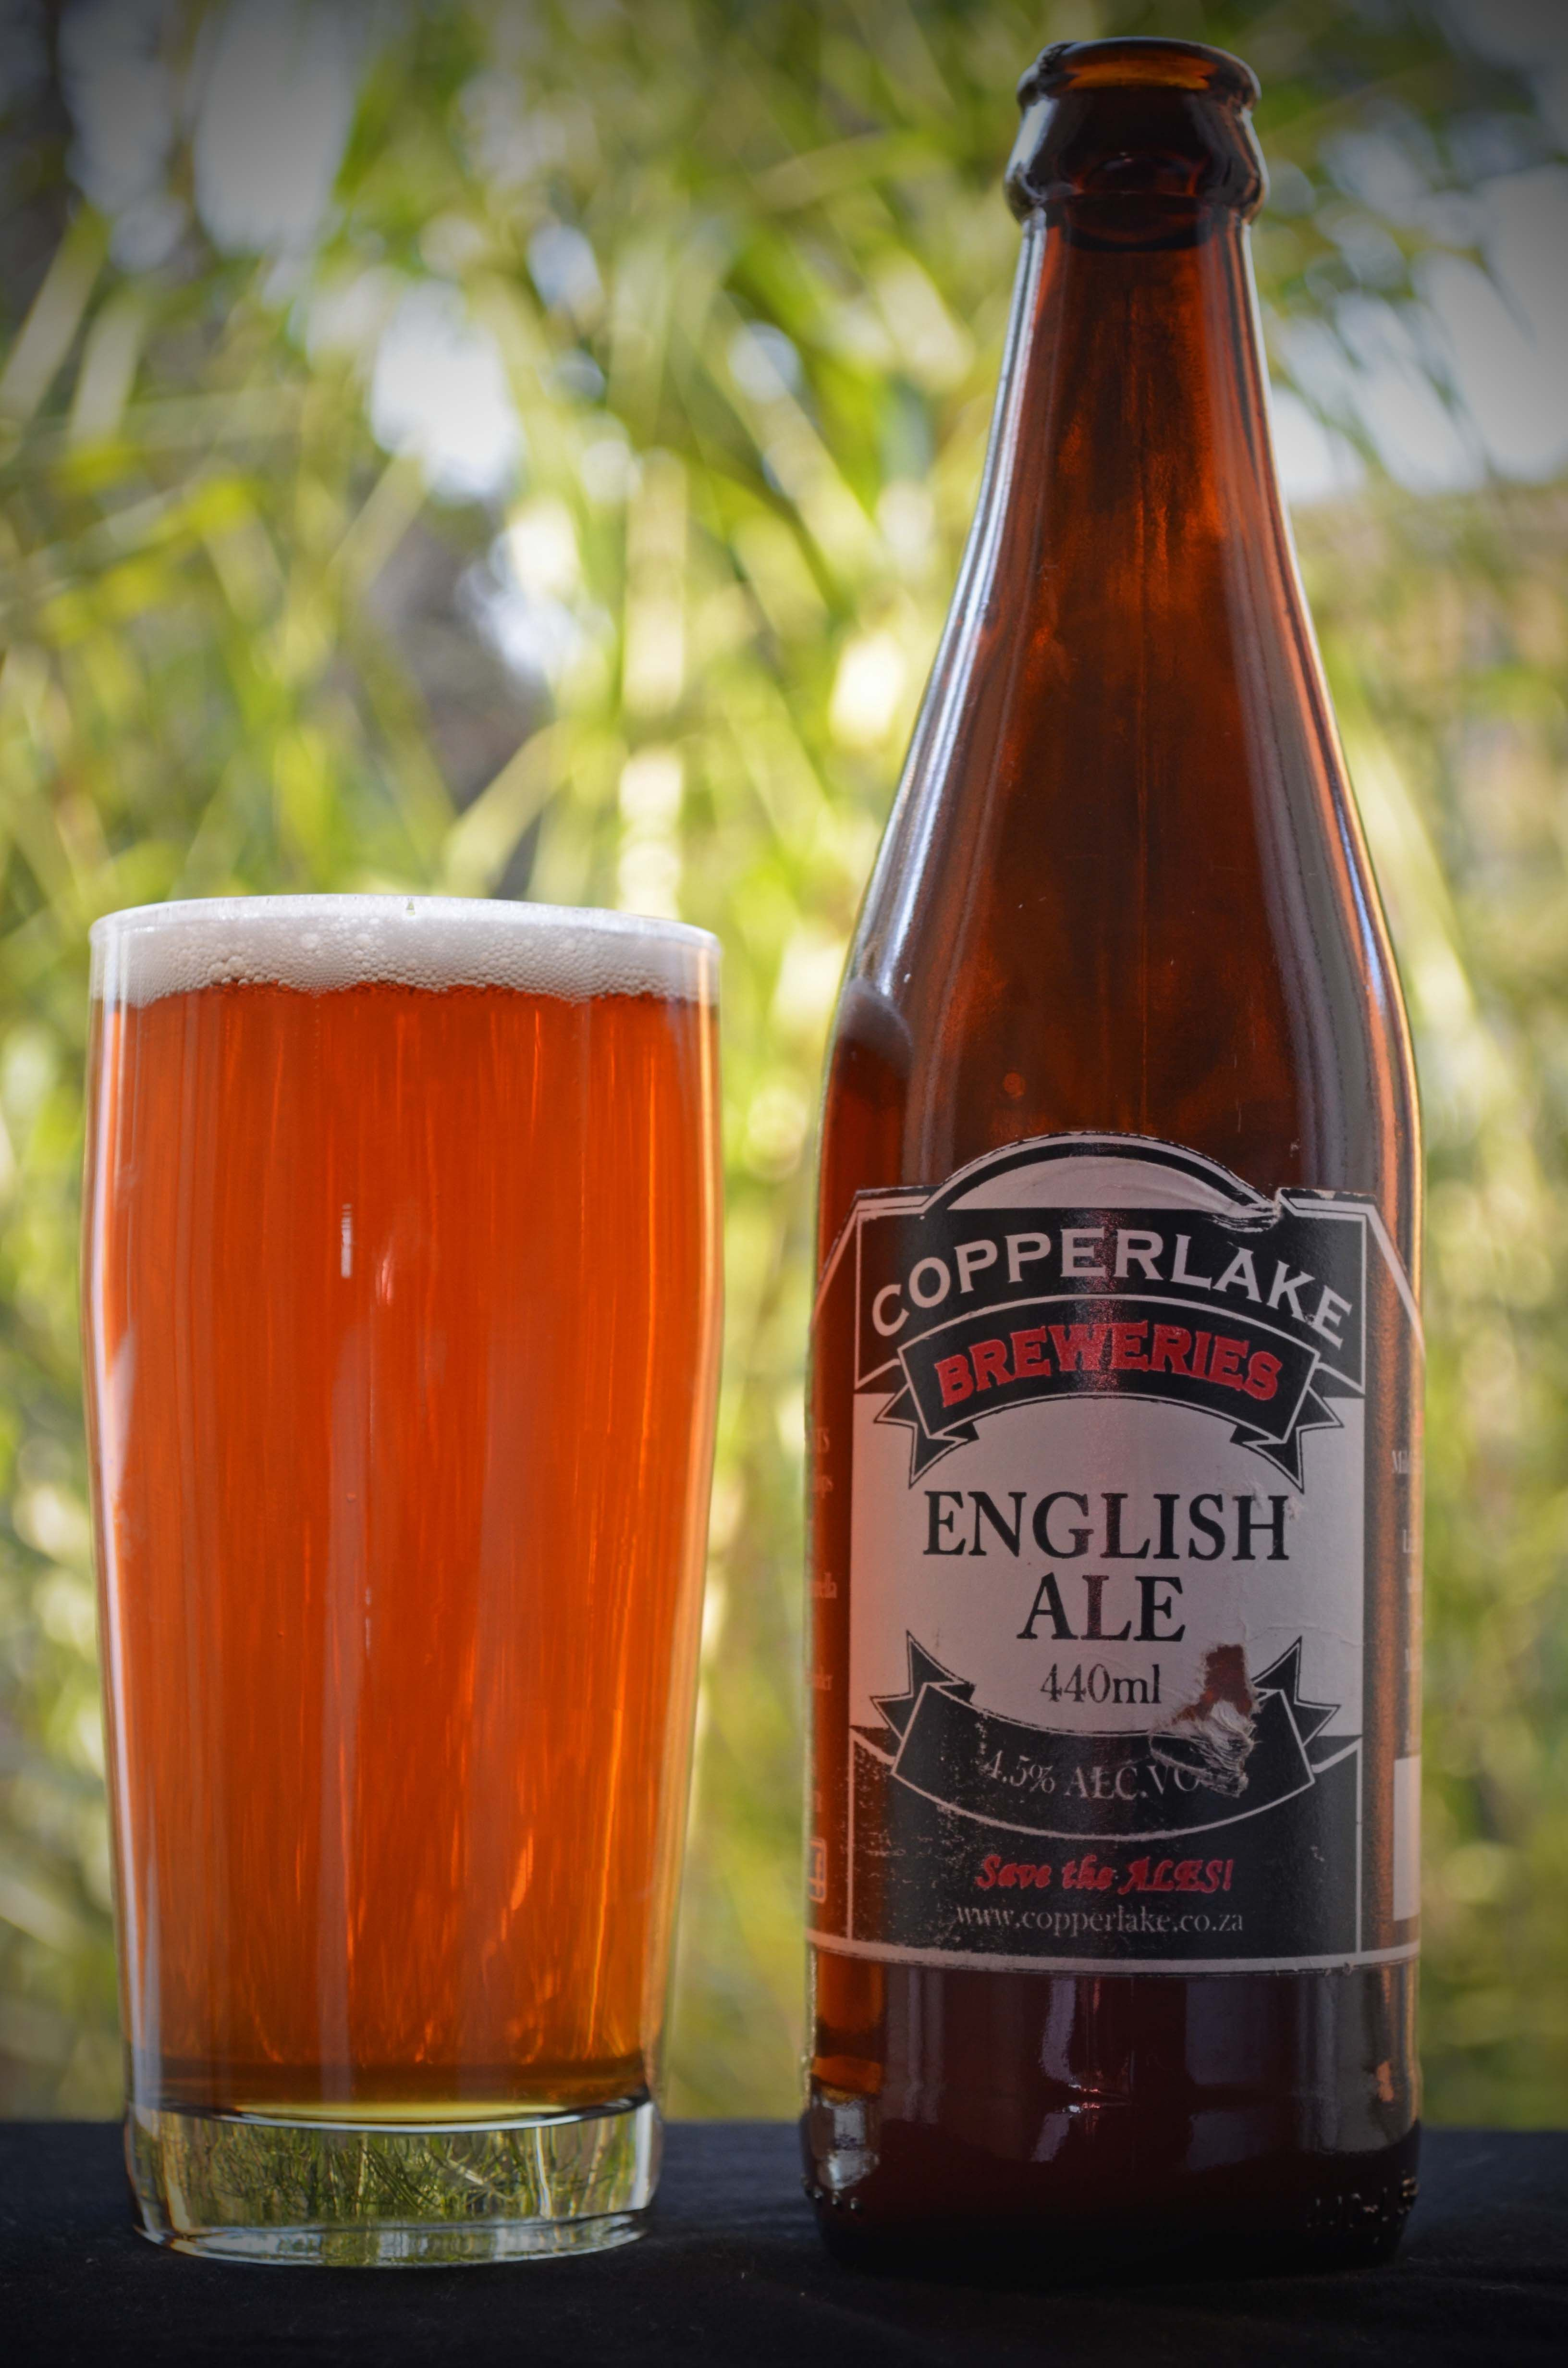 Copperlake Brewery English Ale Beer Bar Beer 101 Beer Bottle